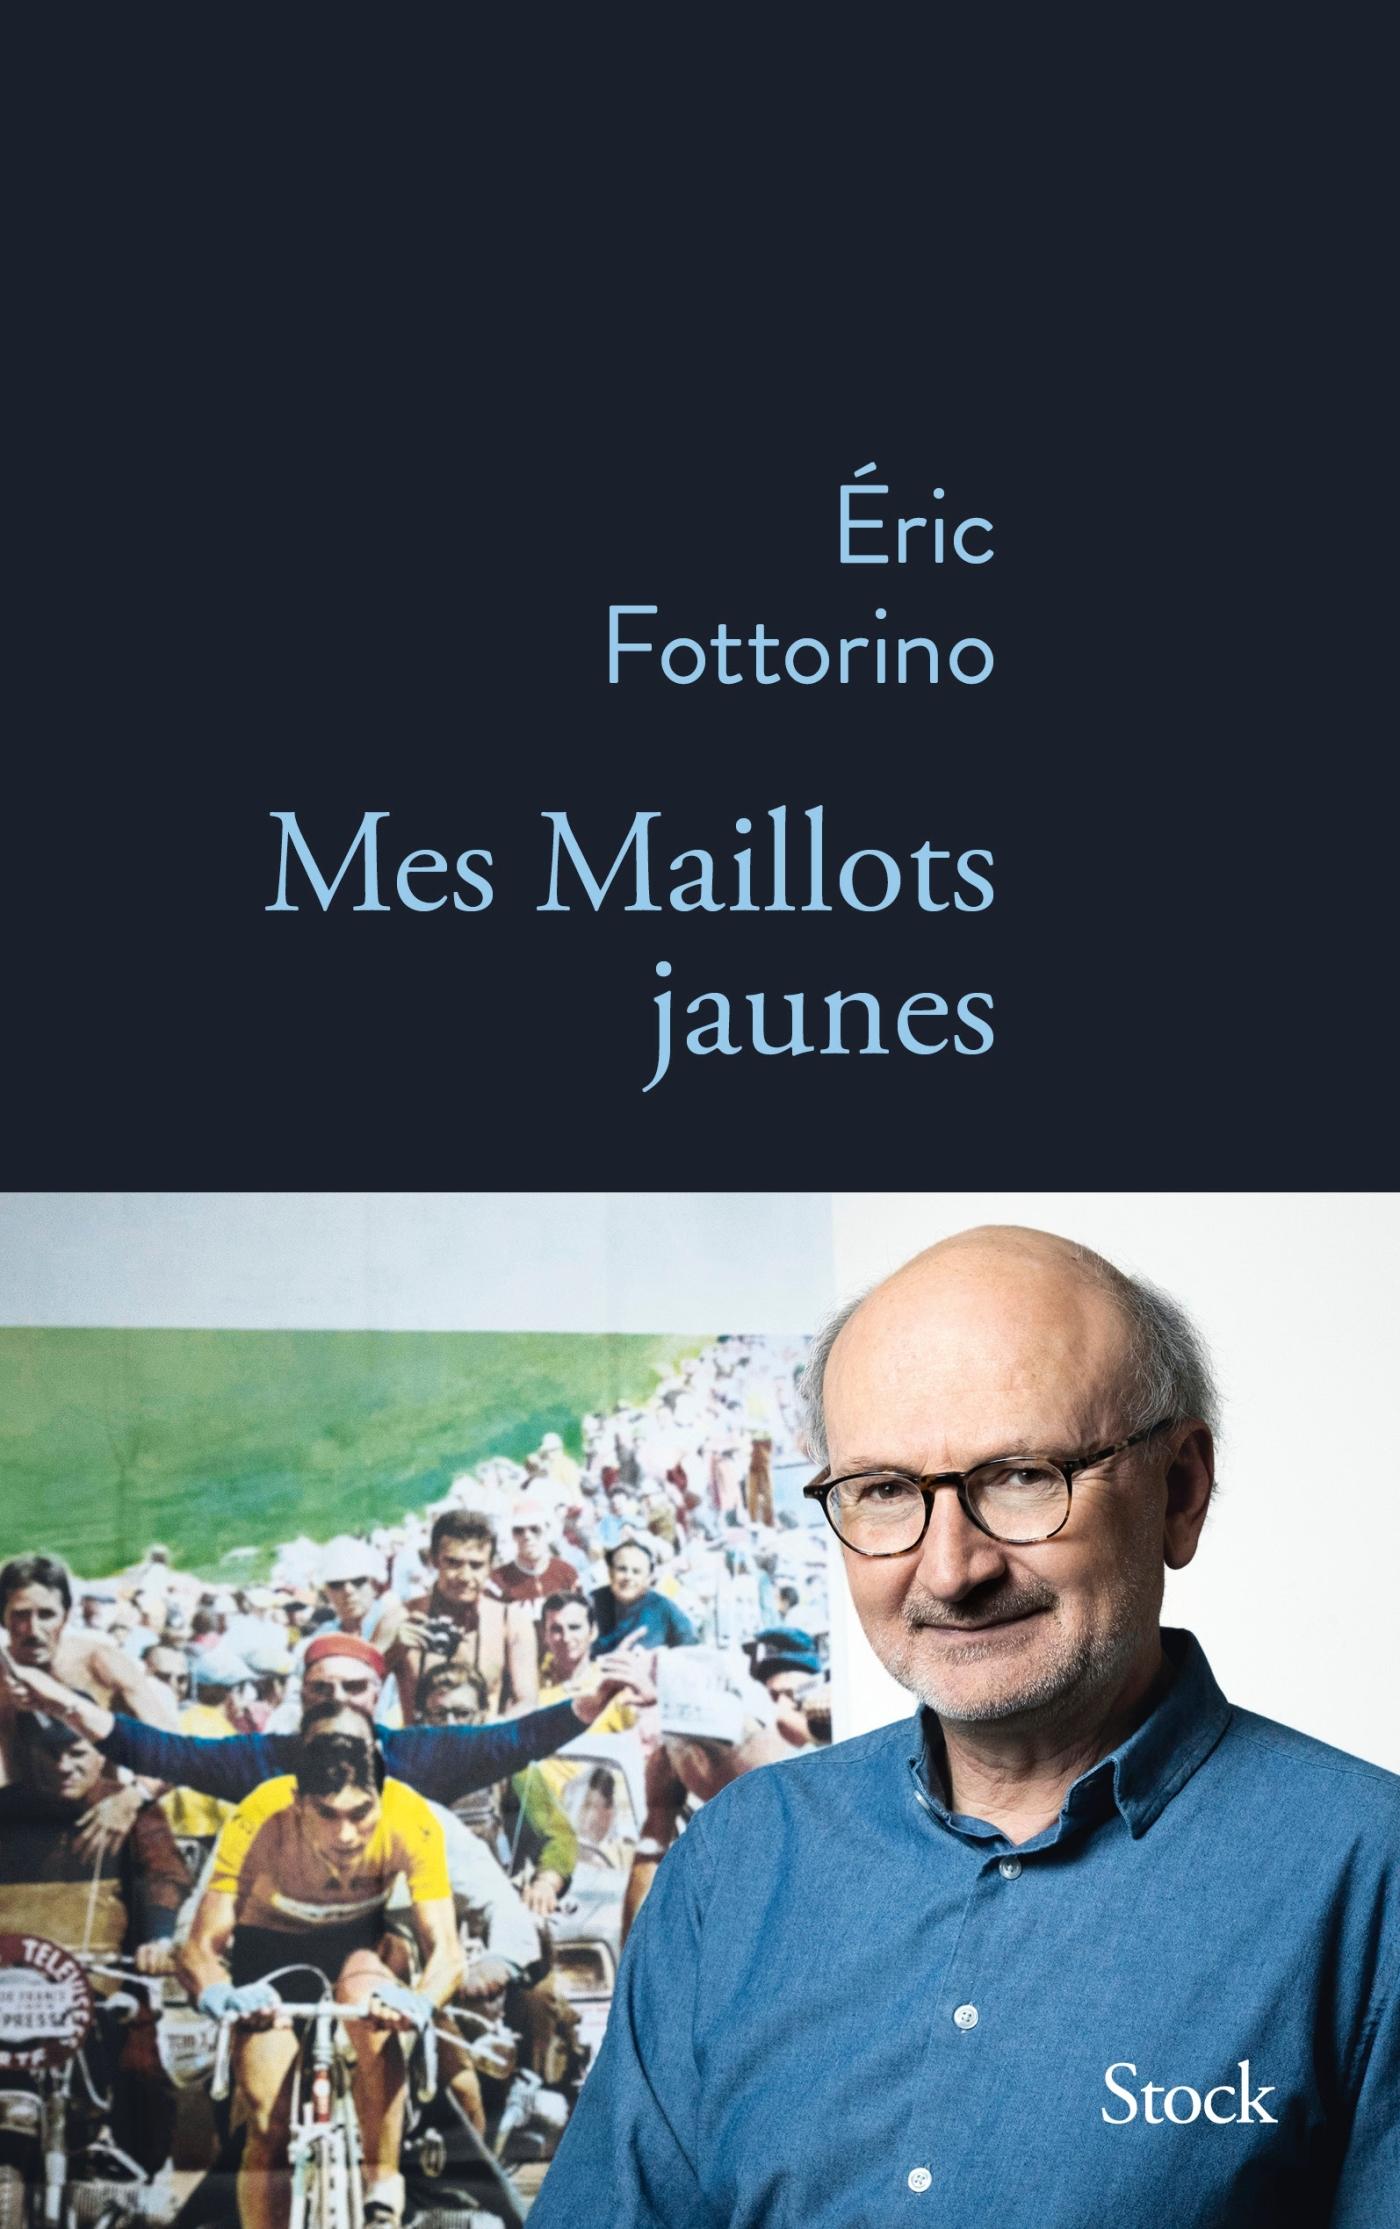 MES MAILLOTS JAUNES